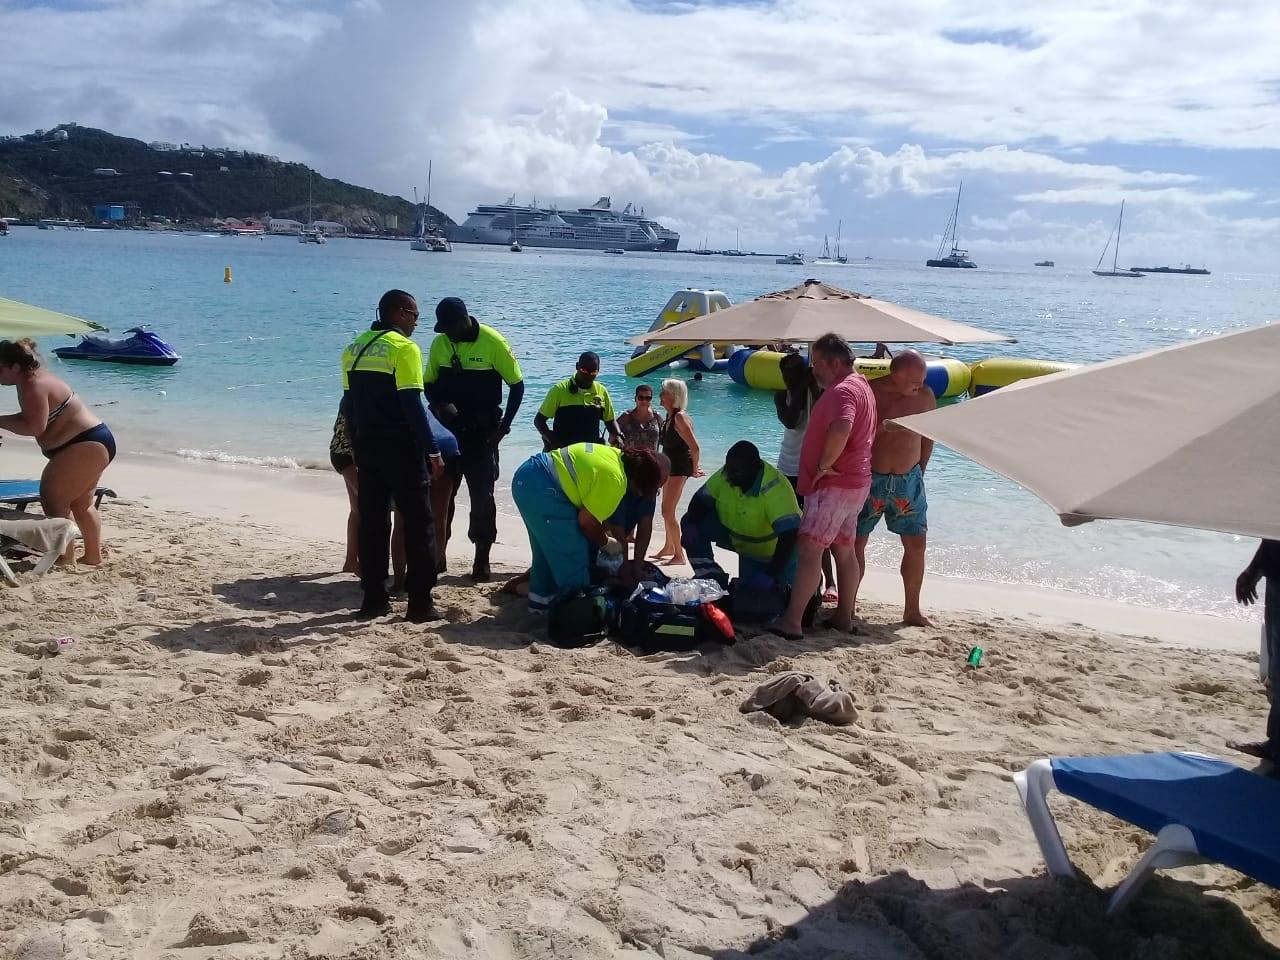 Cruise tourist suffers heart attack 4